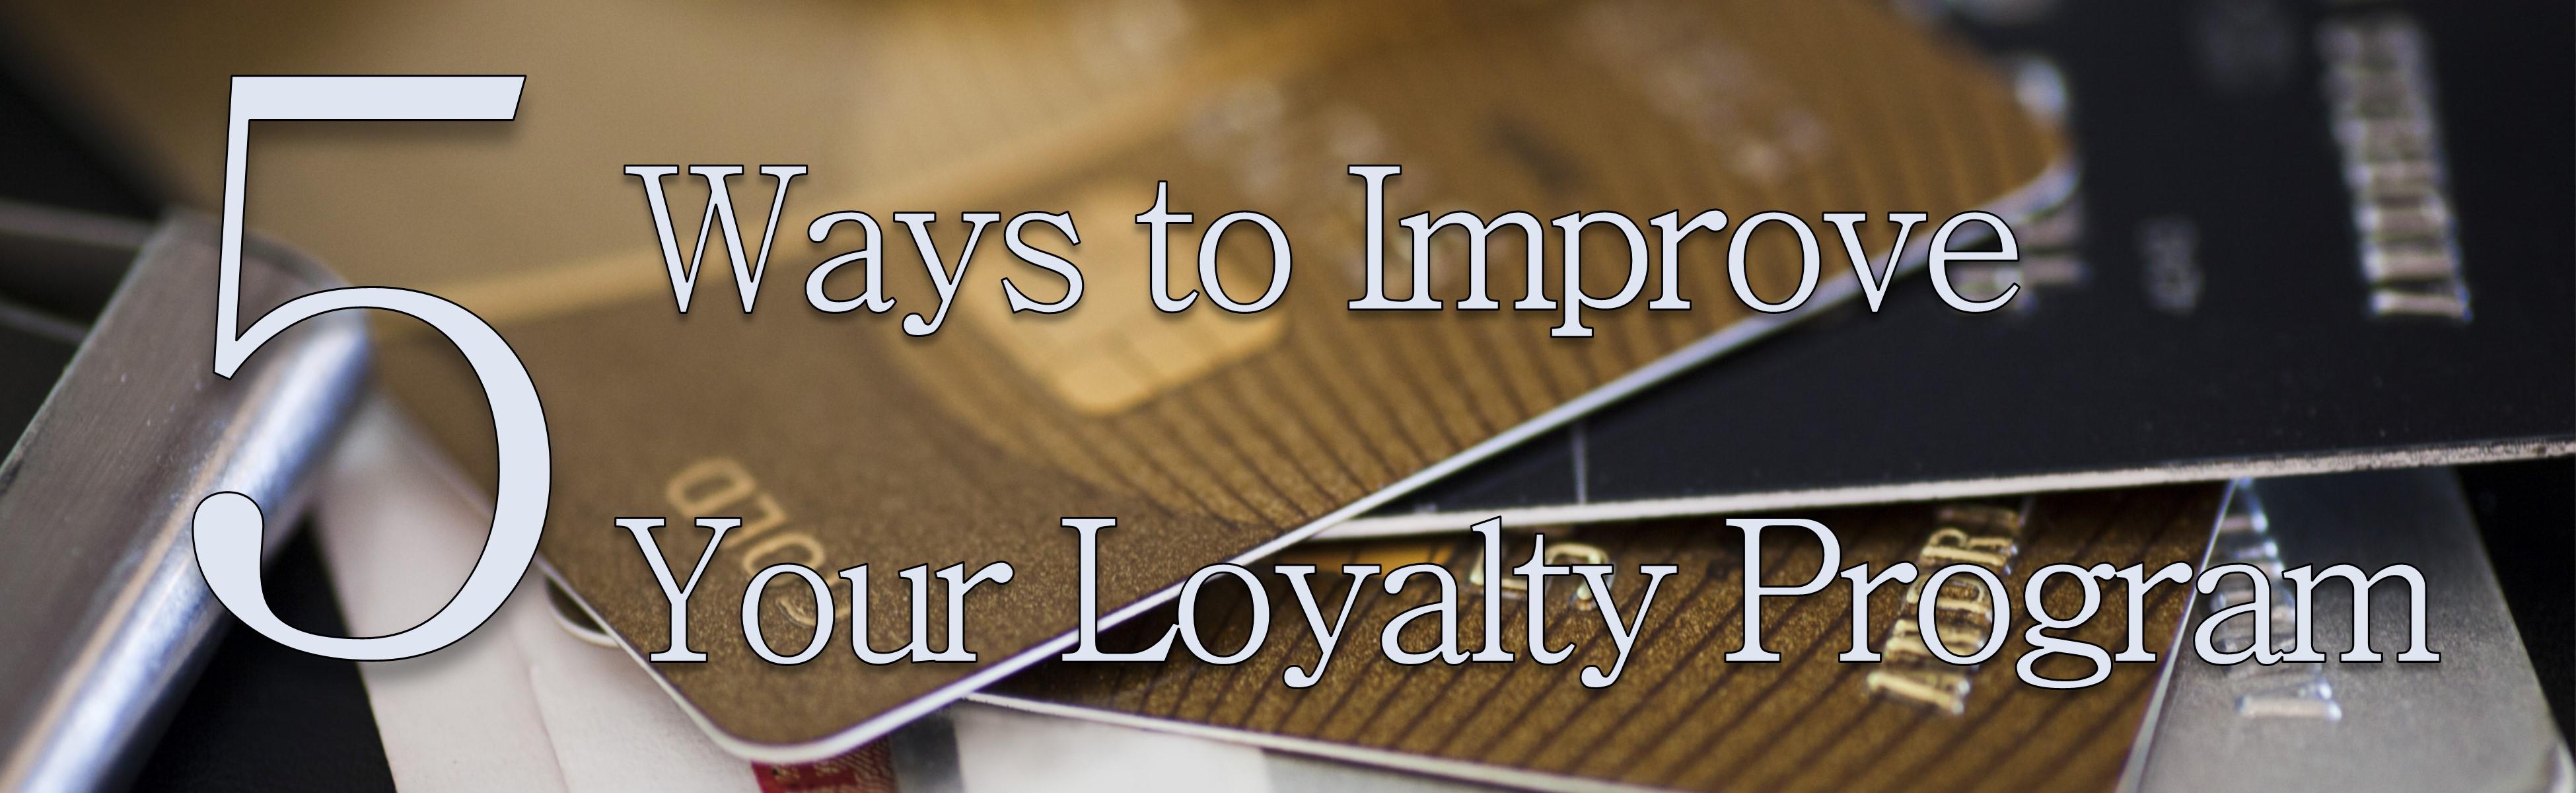 5 Ways to Improve Your Loyalty Program